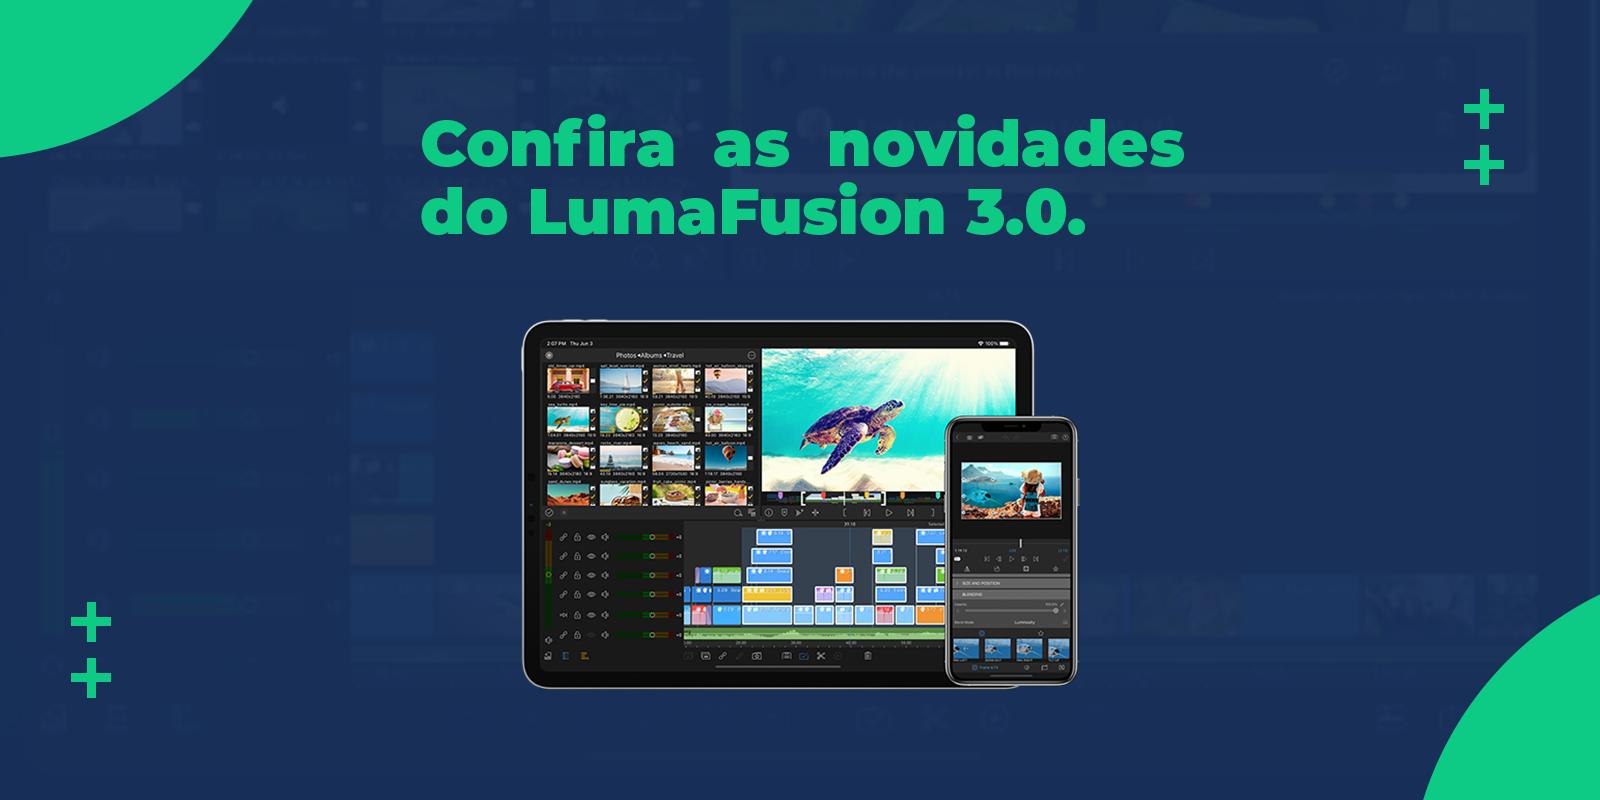 Novidades do LumaFusion 3.0